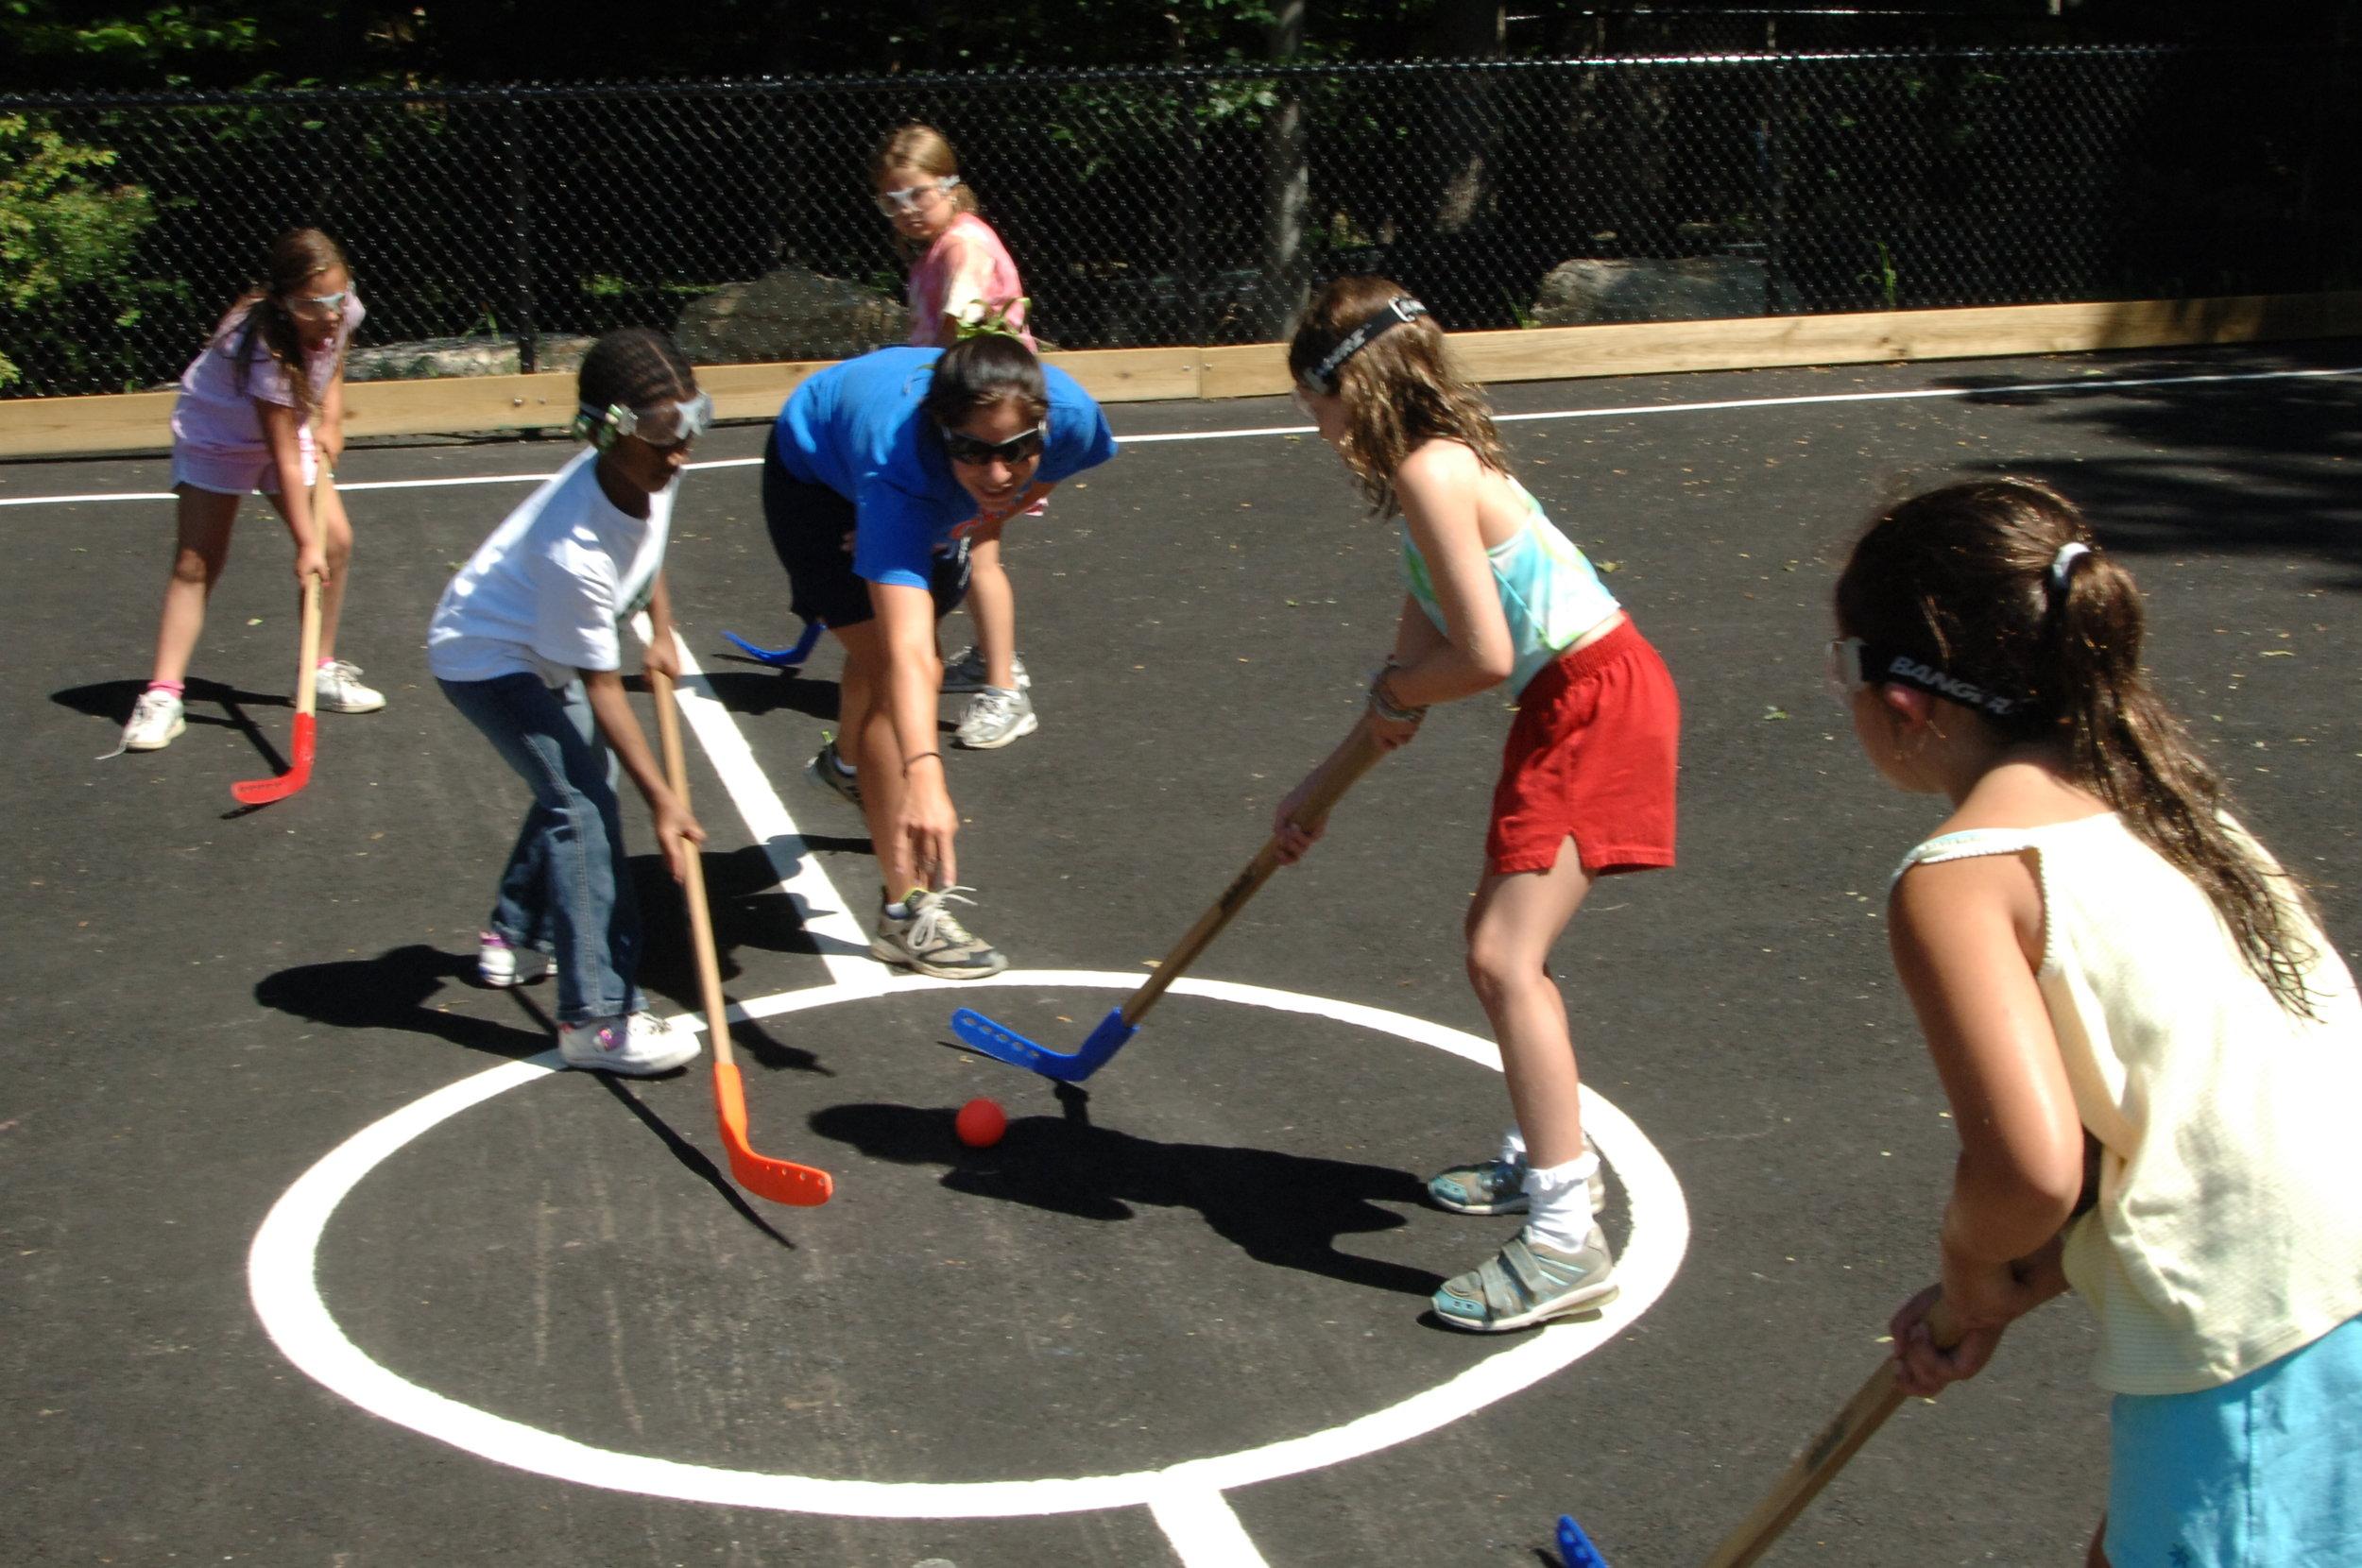 Hockey - Girls faceoff.JPG